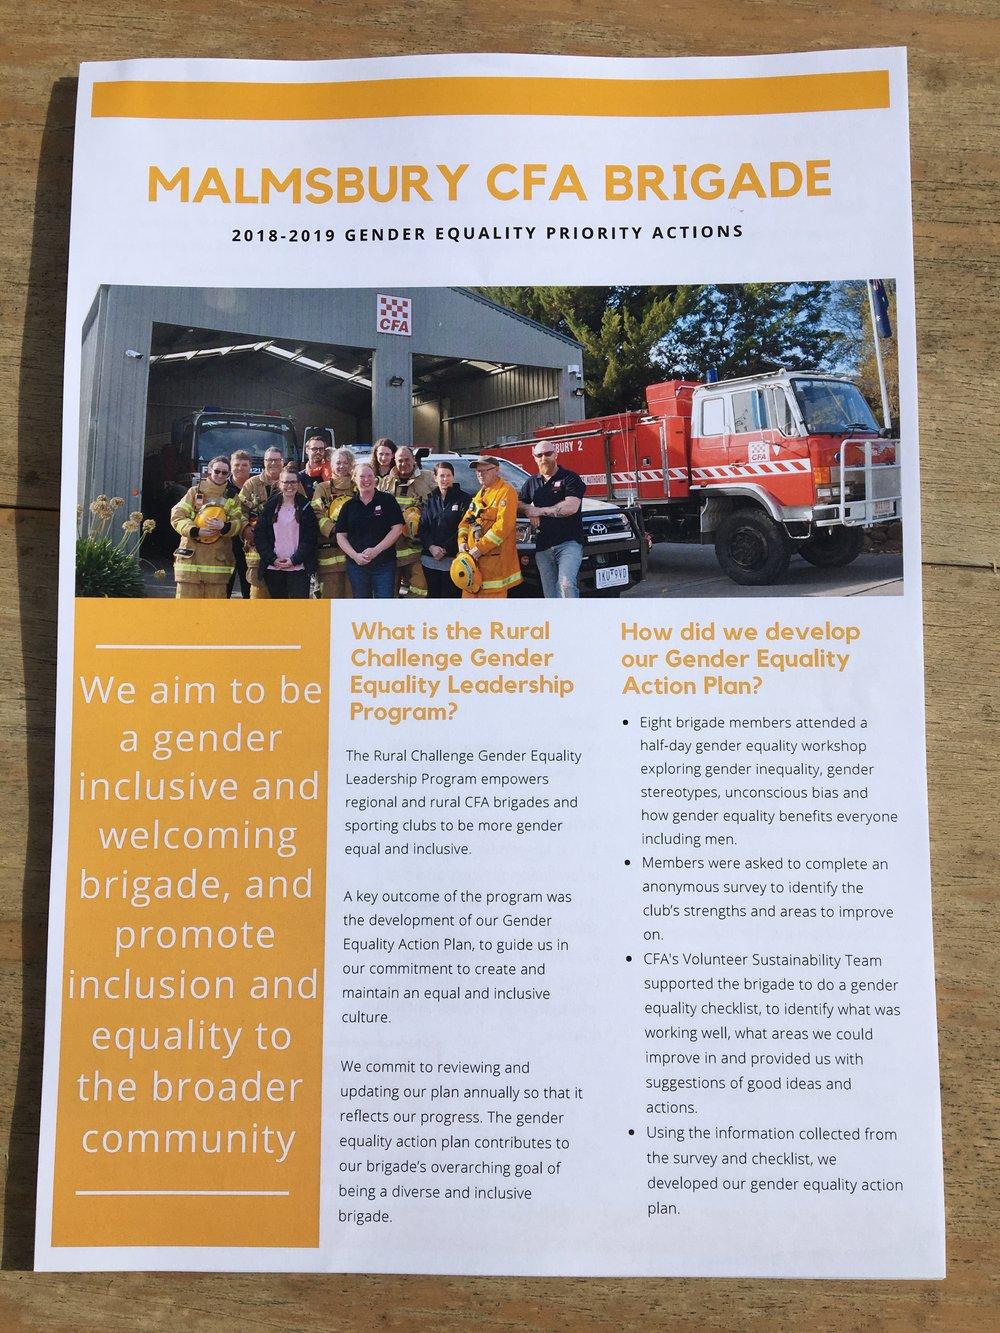 Malmsbury CFA Brigade's Gender Equality Action Plan Goal